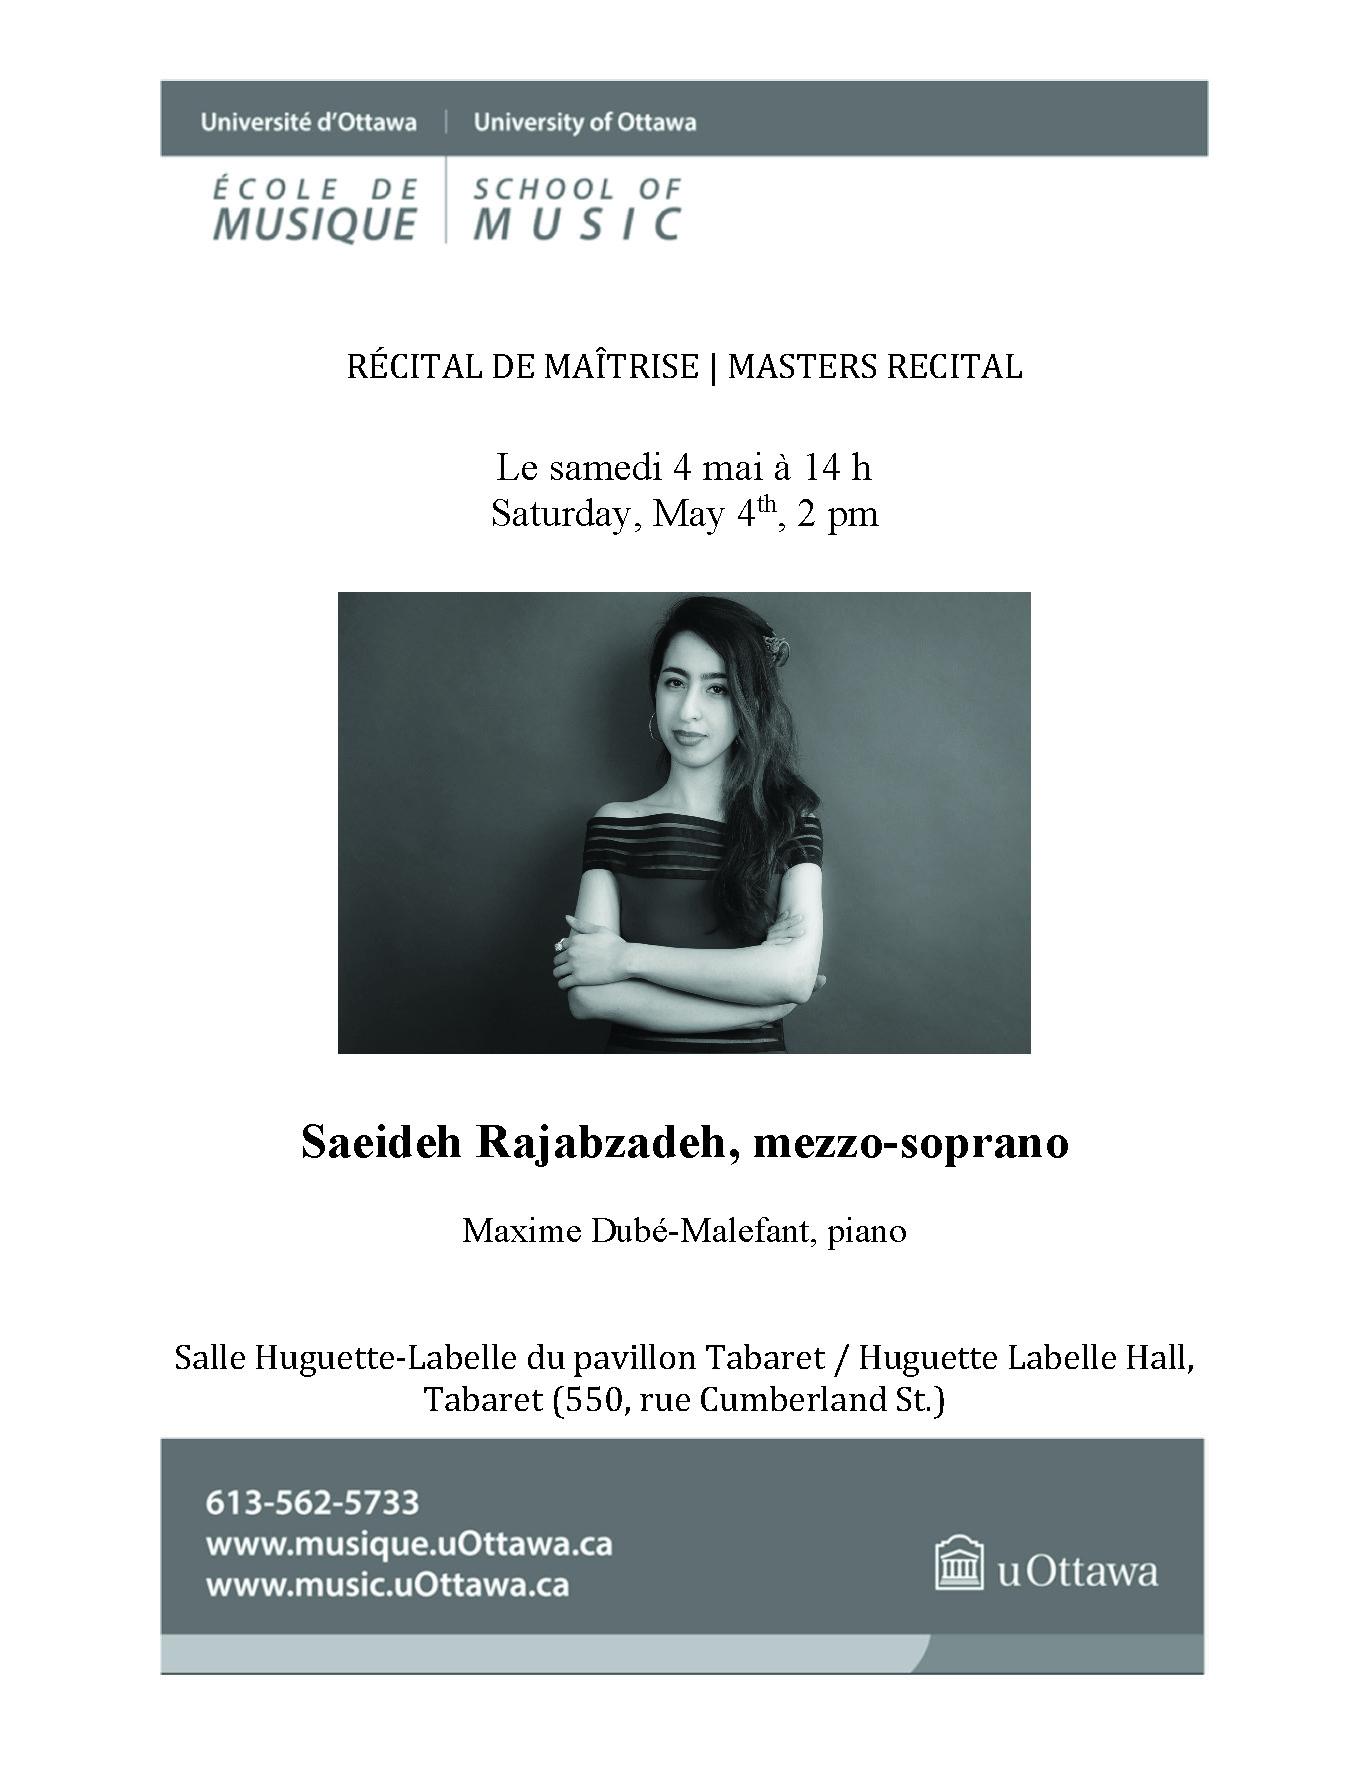 Recital program for Saeideh Rajabzadeh, p. 1